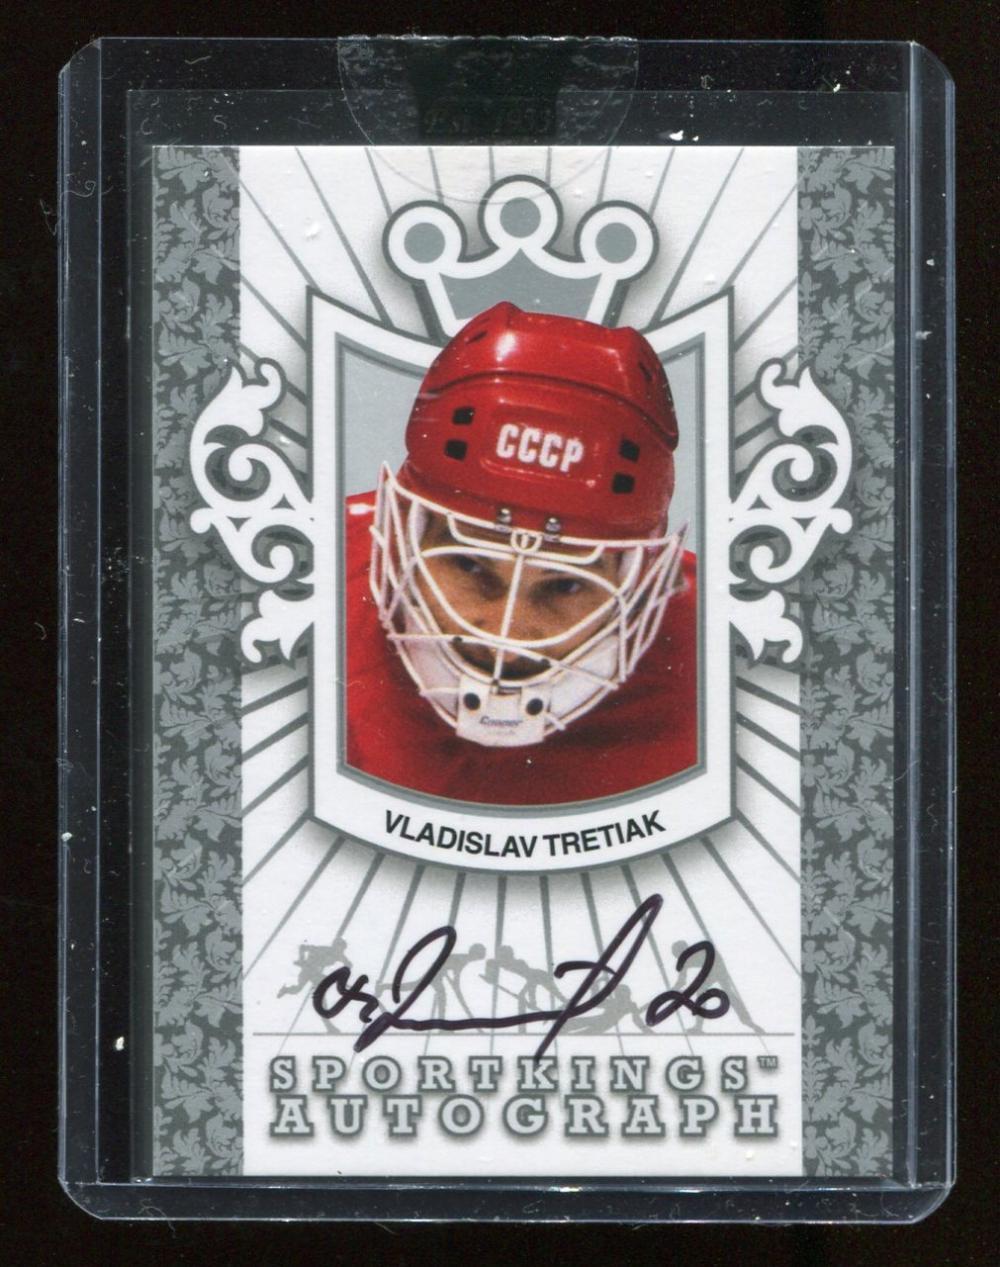 2009 SportKings Vladislav Tretiak Autograph Card A-VT1